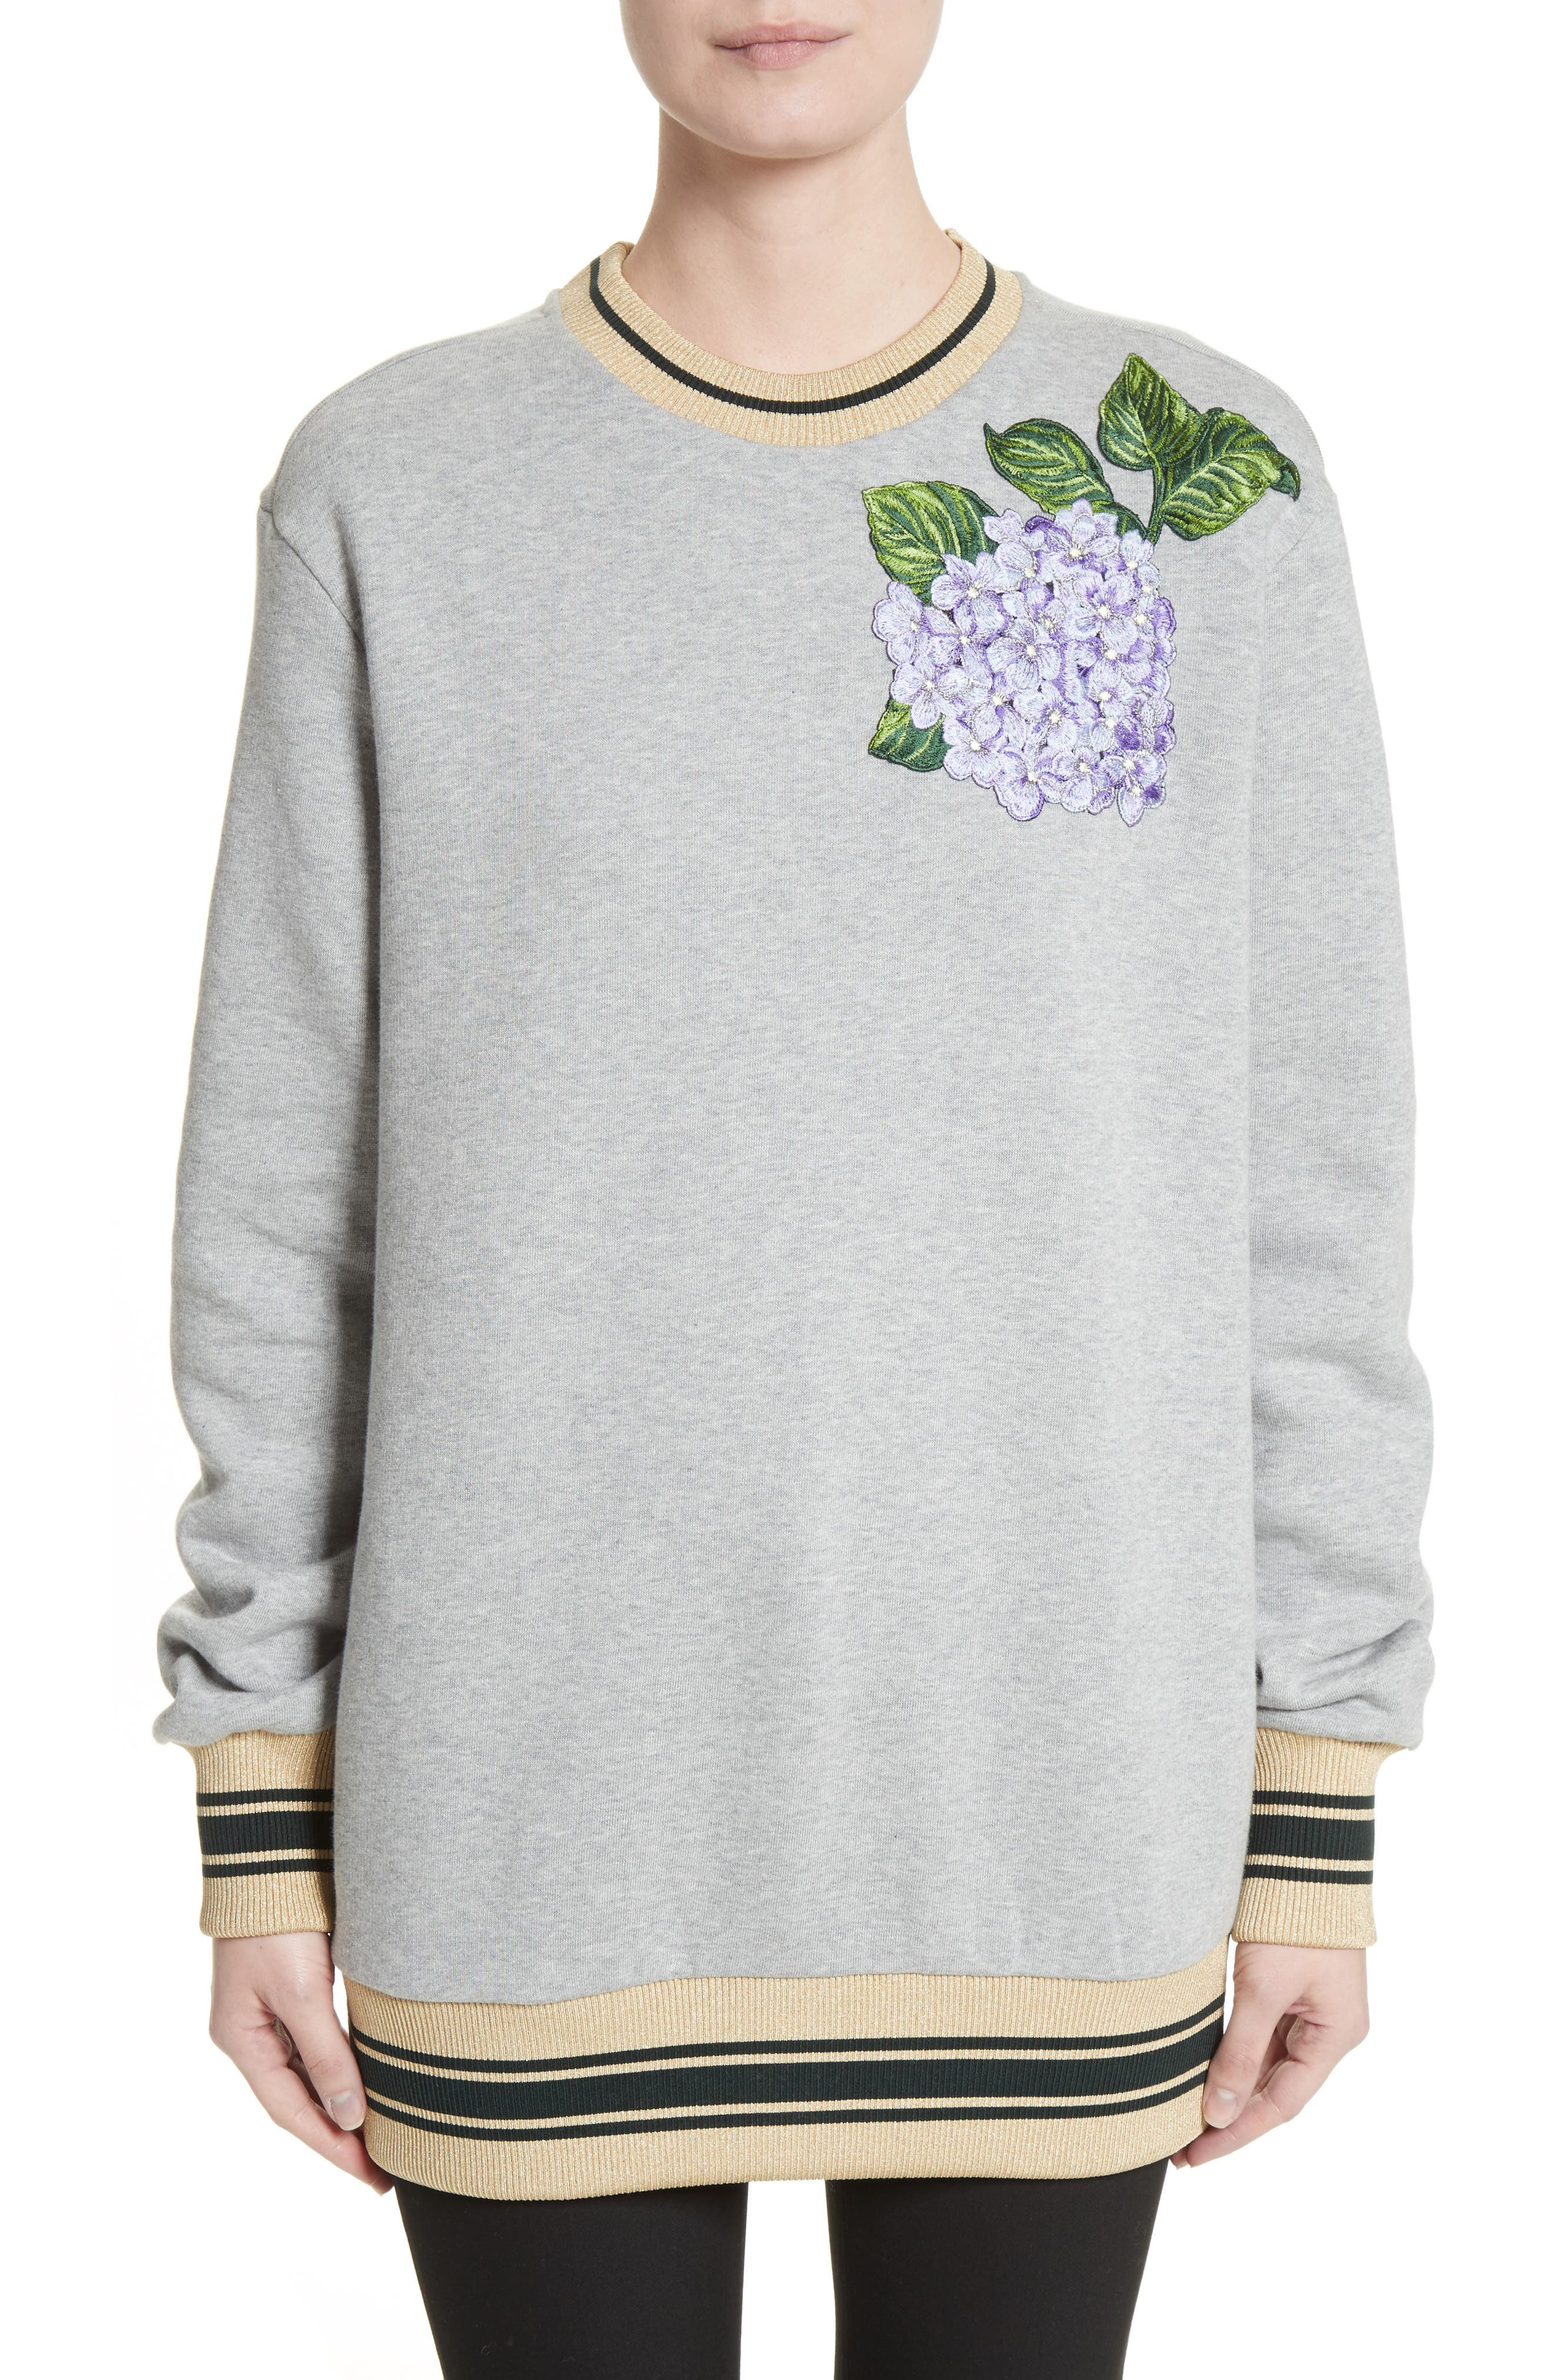 Dolce&Gabbana Hydrangea Patch Sweatshirt